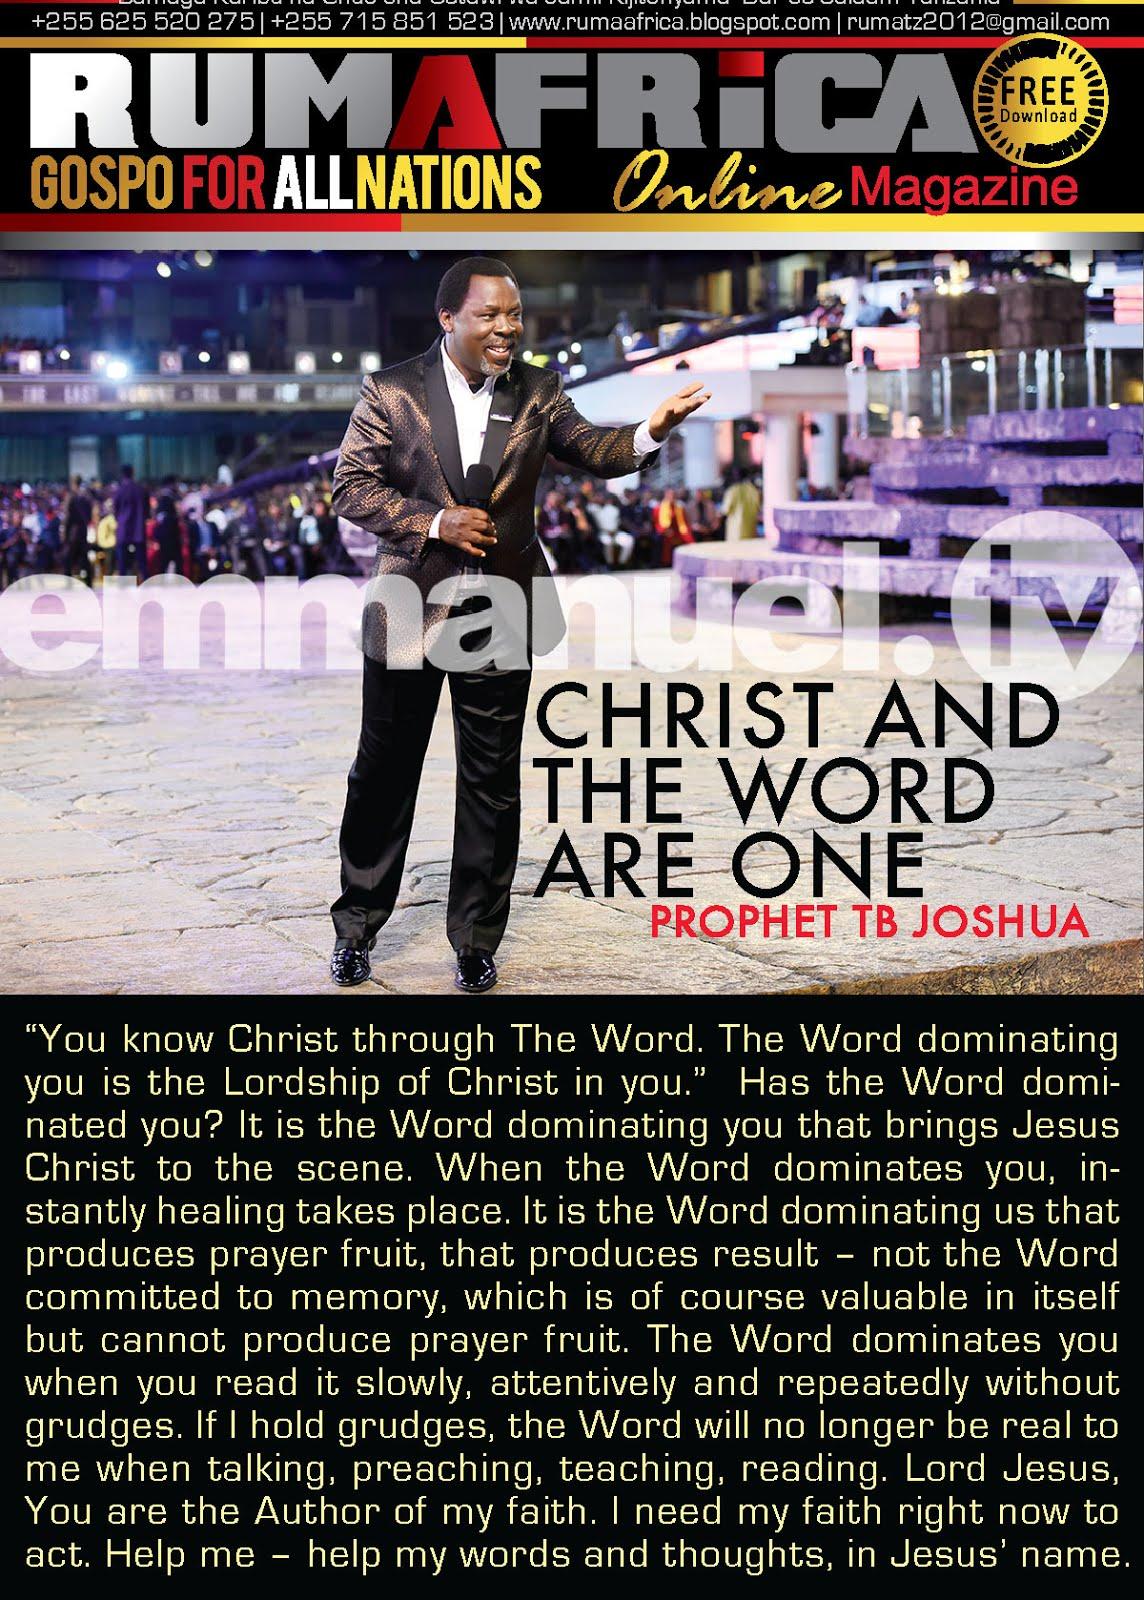 PROPHET TB JOSHUA: YOUR FAITH WILL NOT FAIL